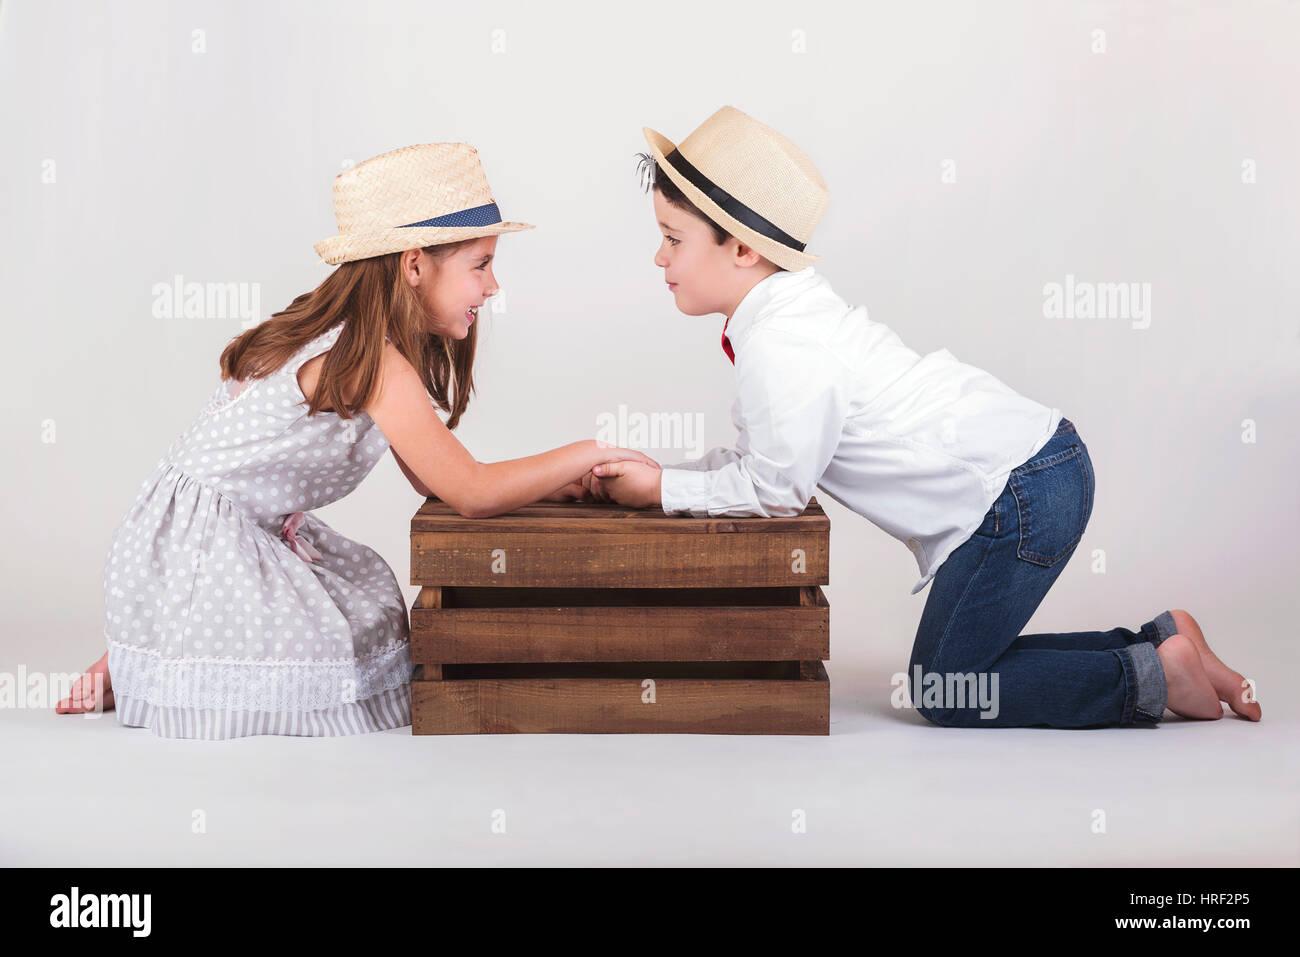 Little boyfriends. Gives a little boy Valentine's heart to girlfriend. - Stock Image